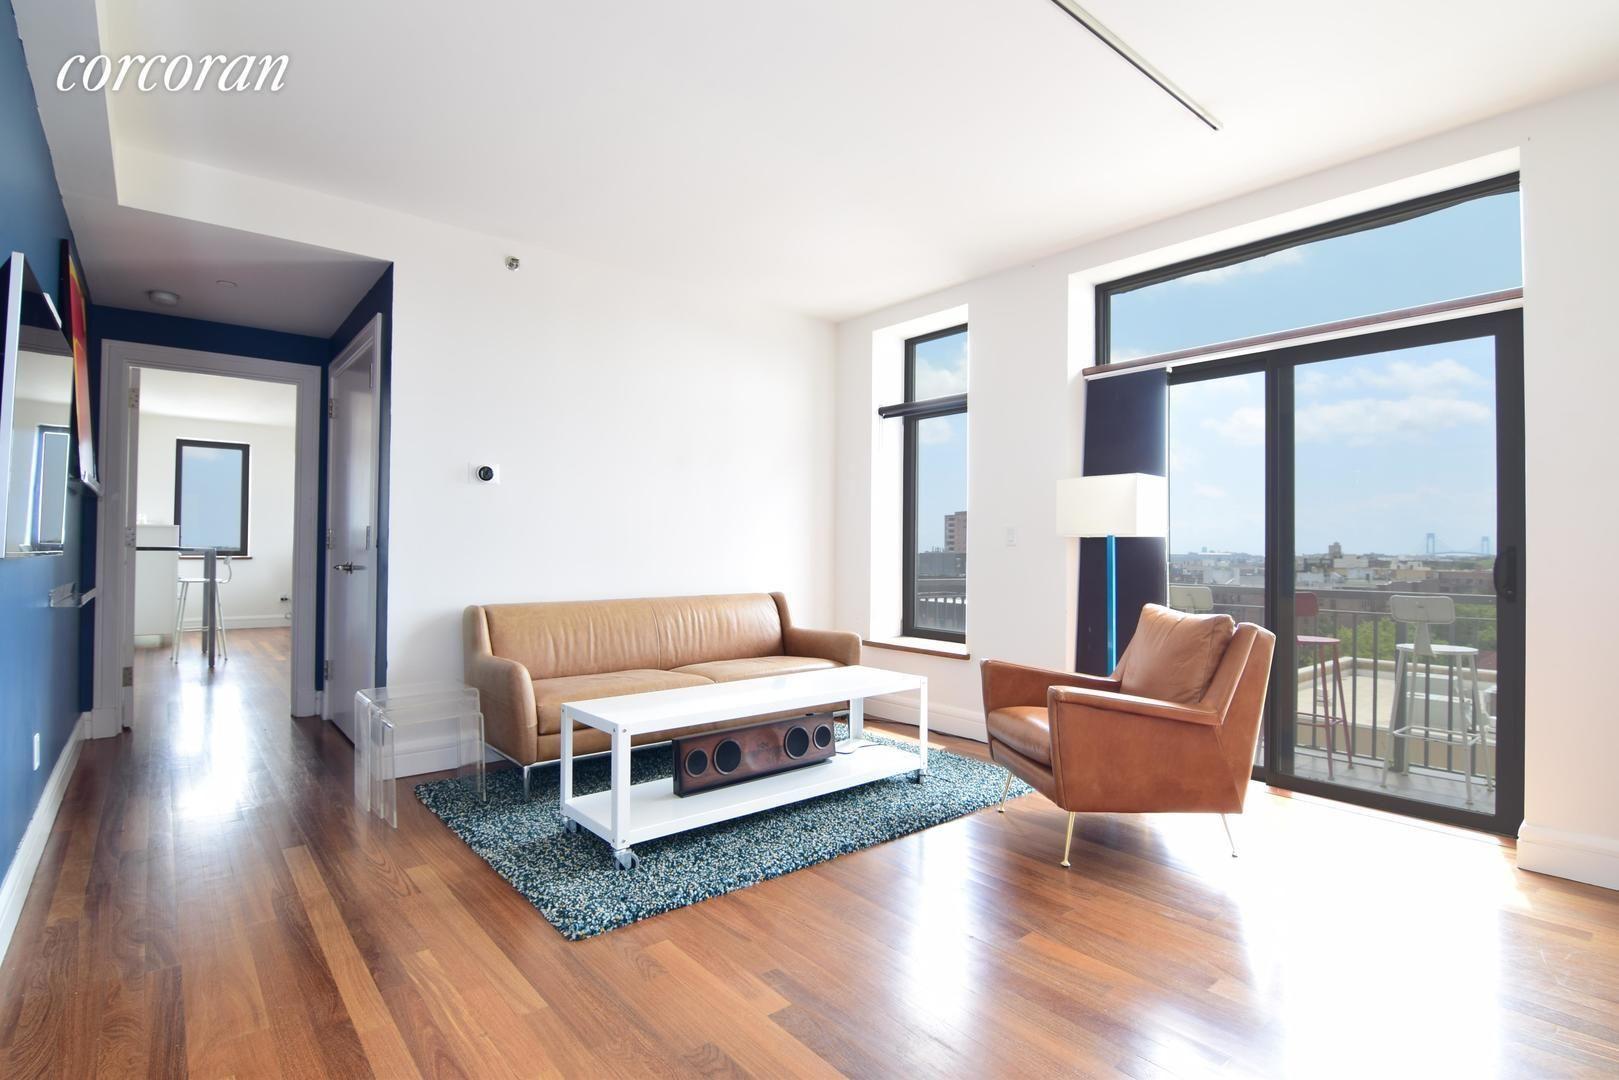 Apartment for sale at 346 Coney Island Avenue, Apt 904